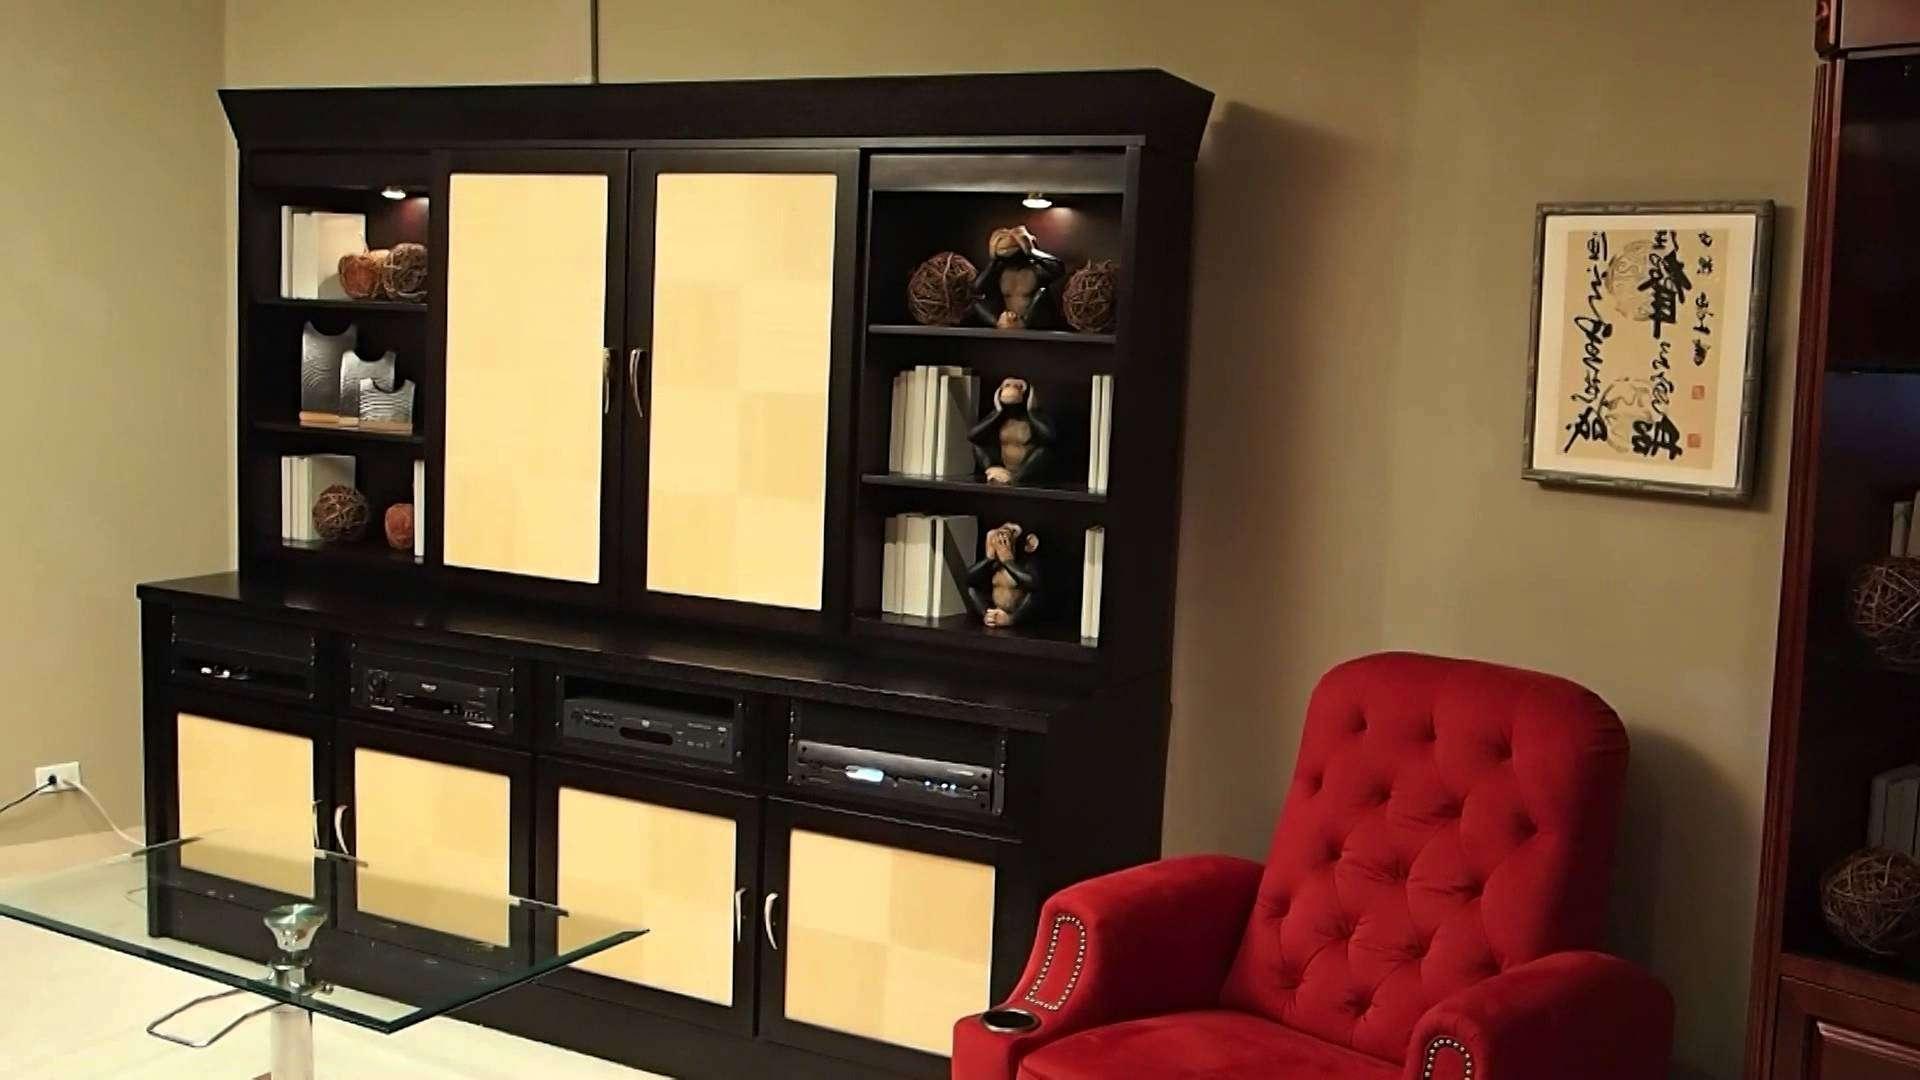 Sliding Door Motorized Tv Cabinet – Youtube In Wall Mounted Tv Cabinets With Sliding Doors (View 13 of 20)